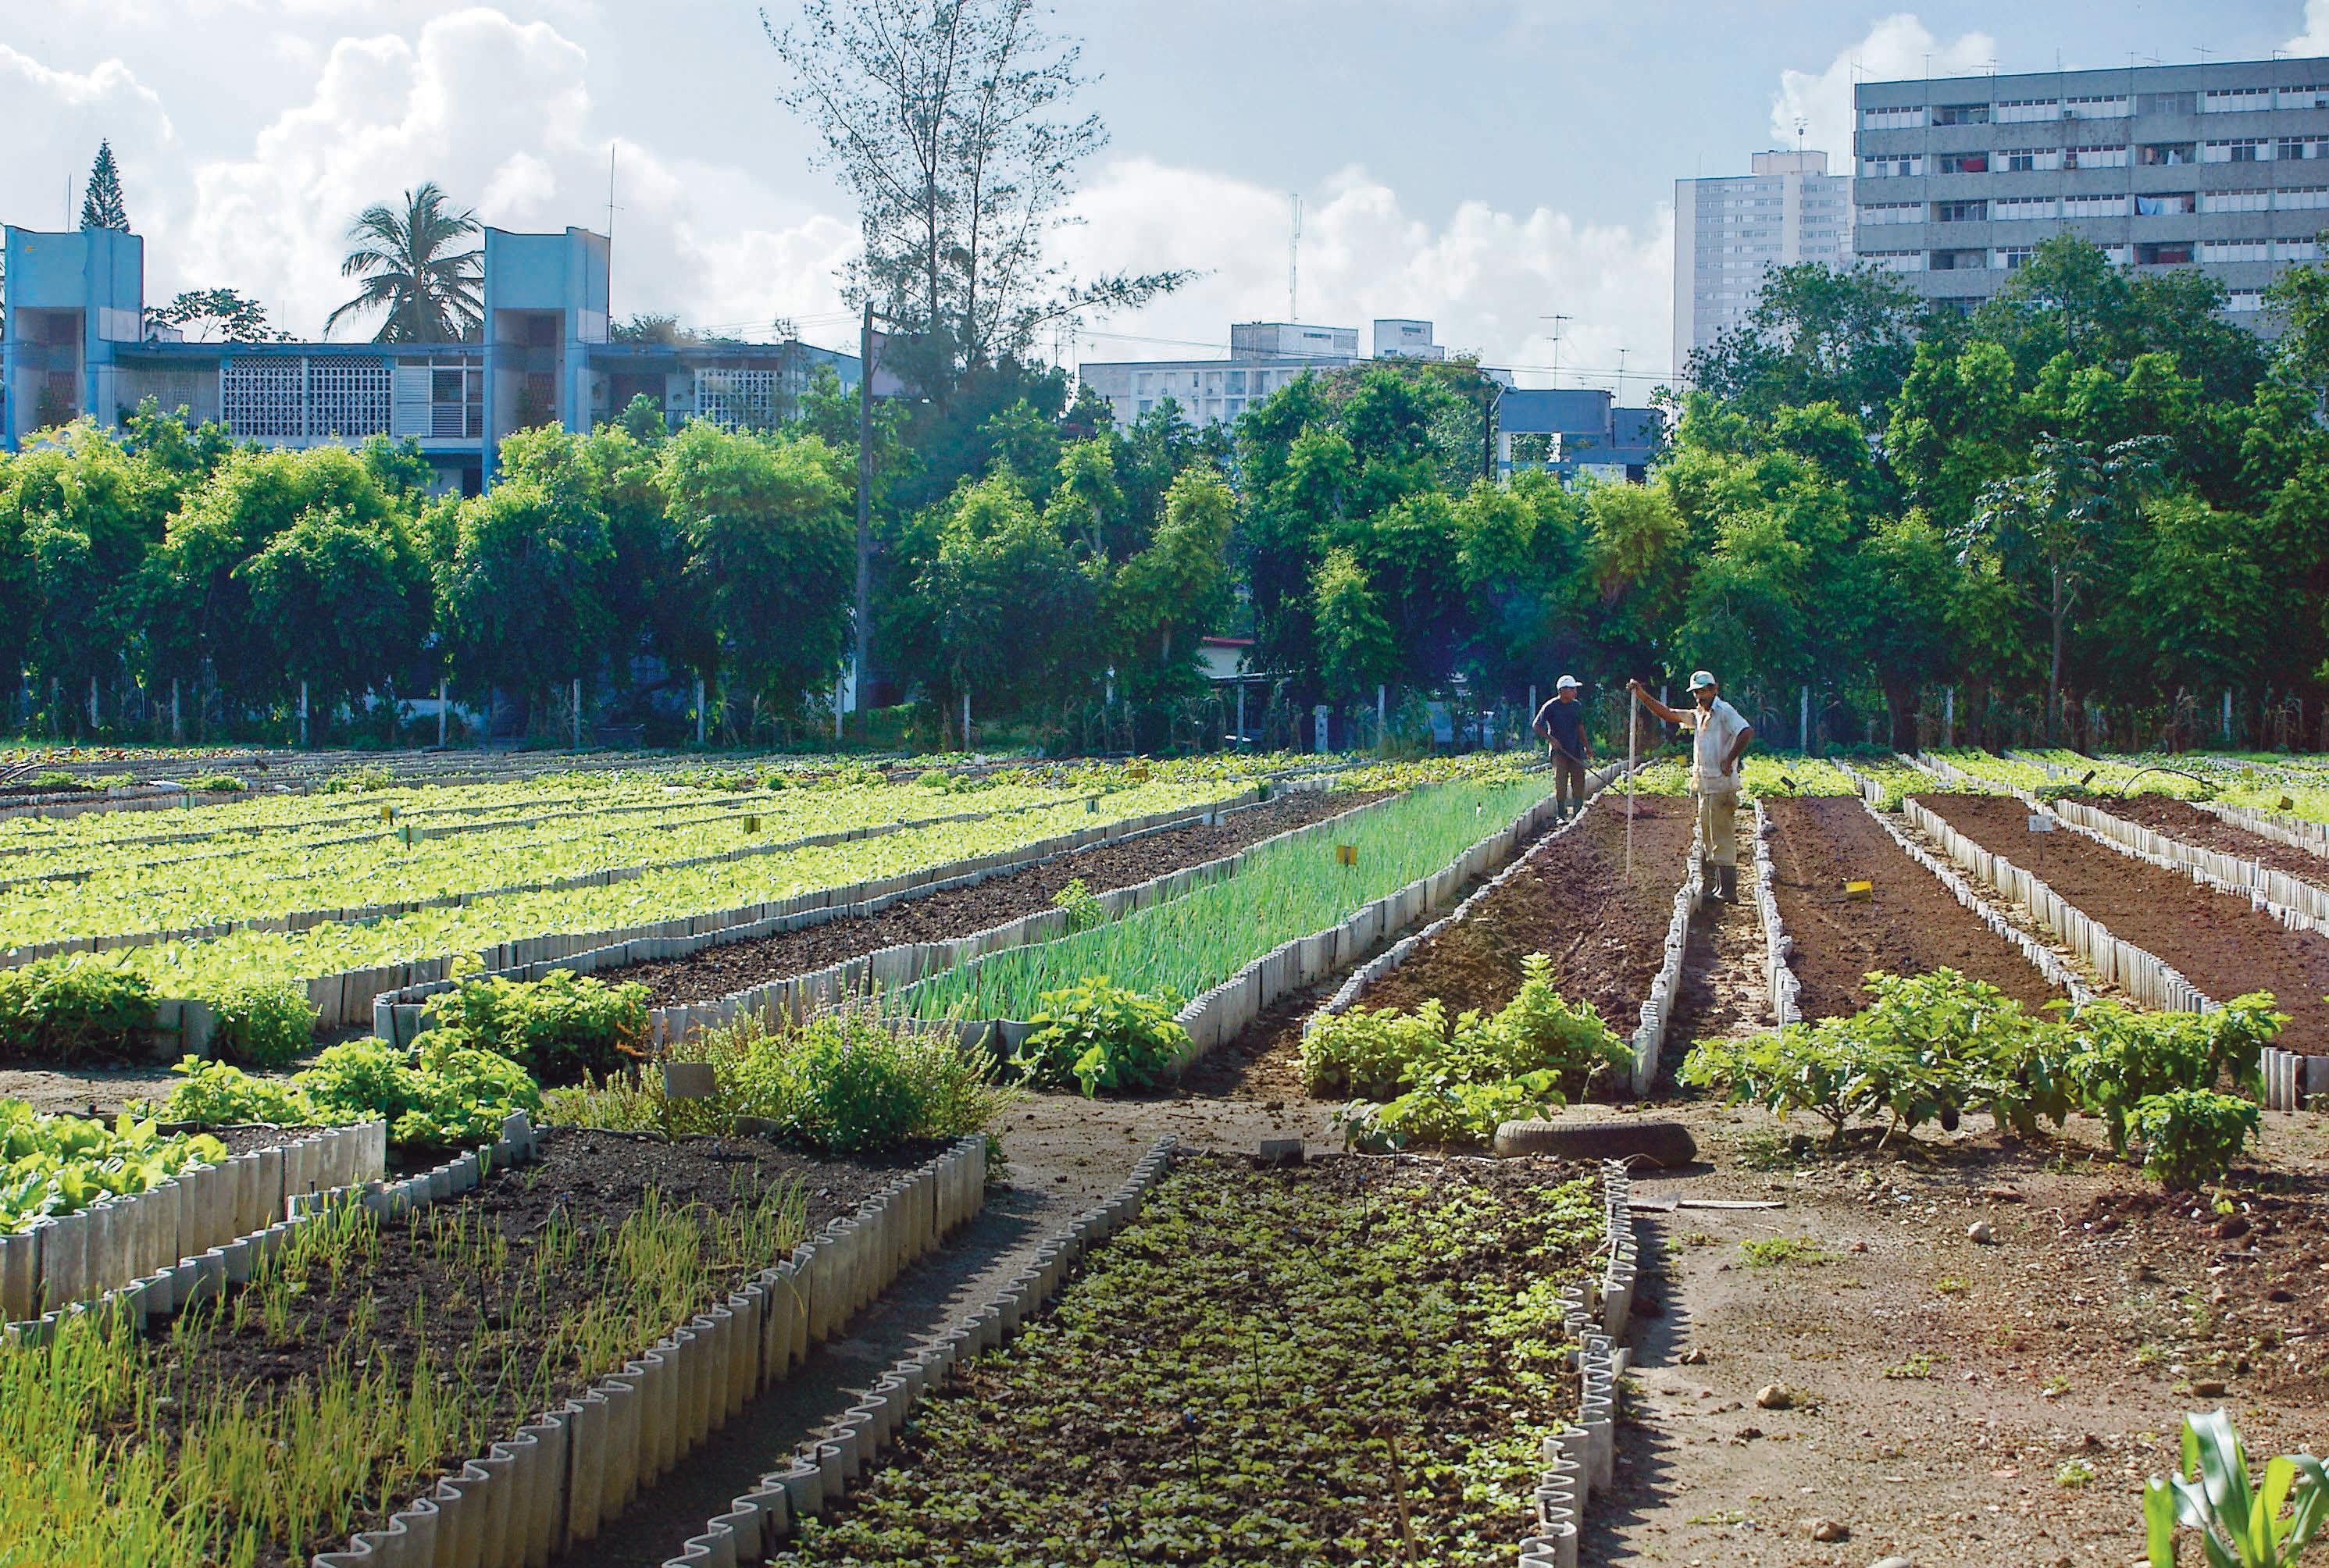 Urban Agriculture In Cuba C 2004 John M Morgan From The Film